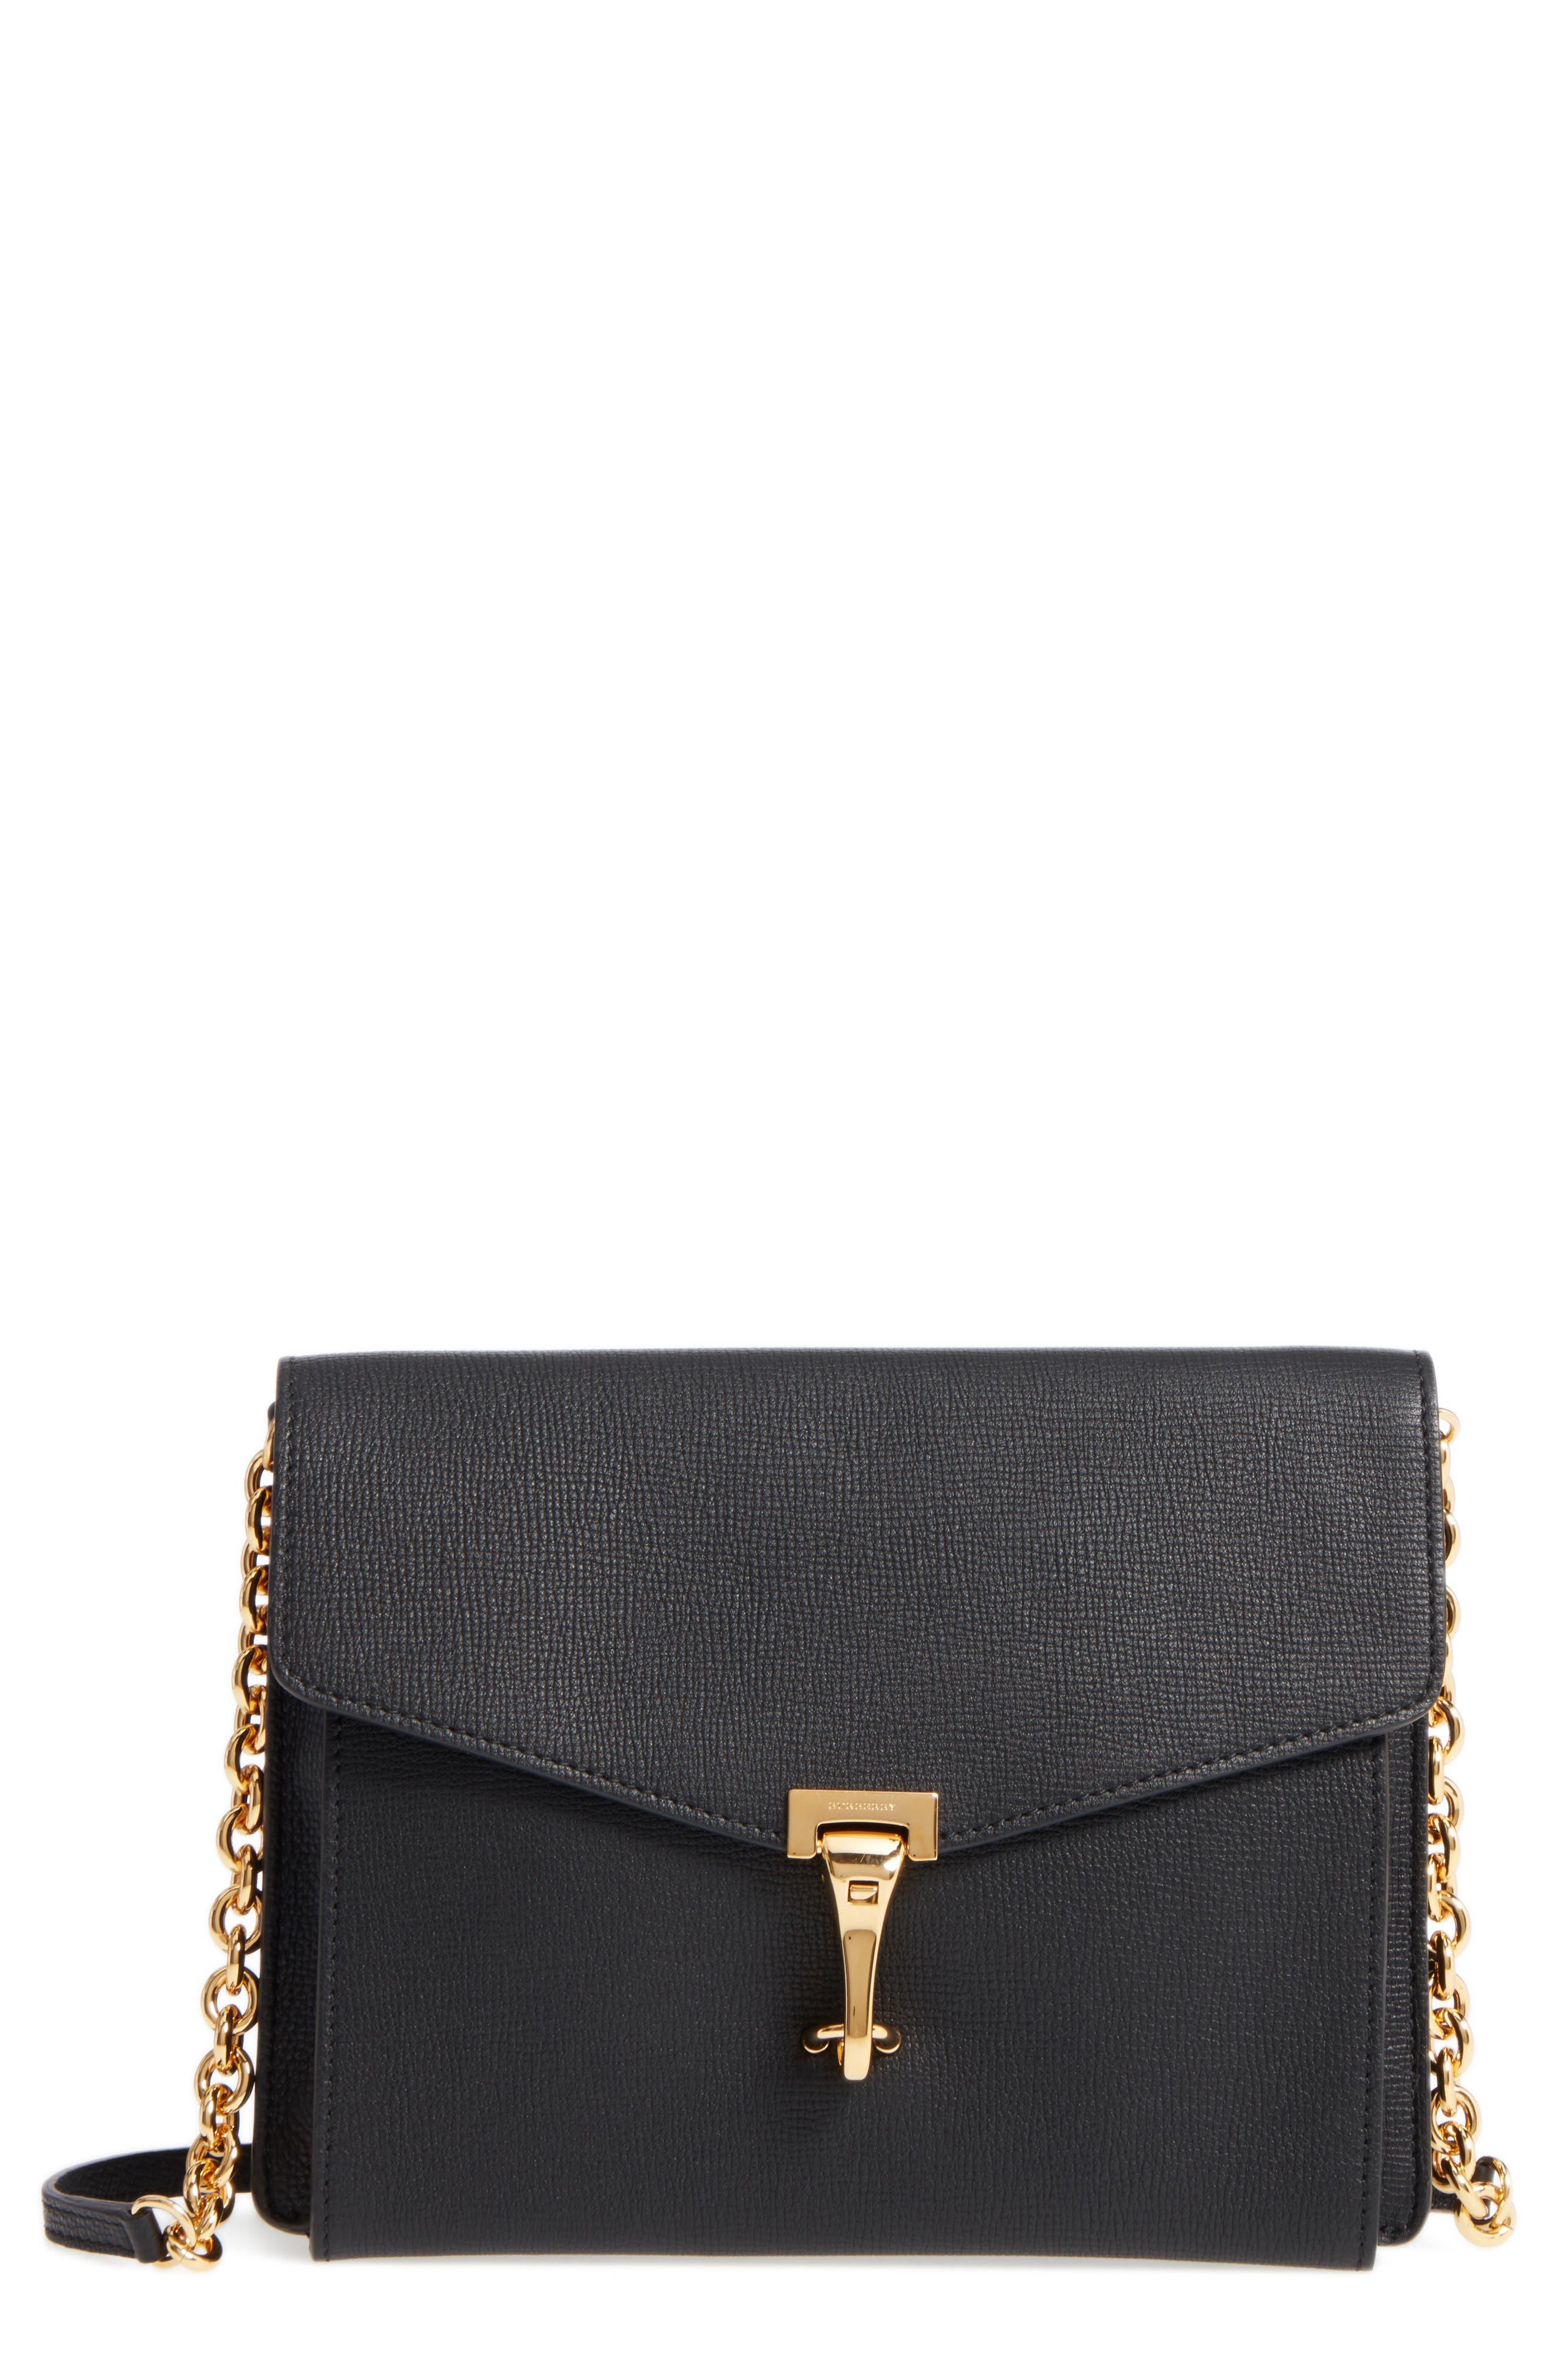 Alternate Image 1 Selected - Burberry Macken Leather Crossbody Bag